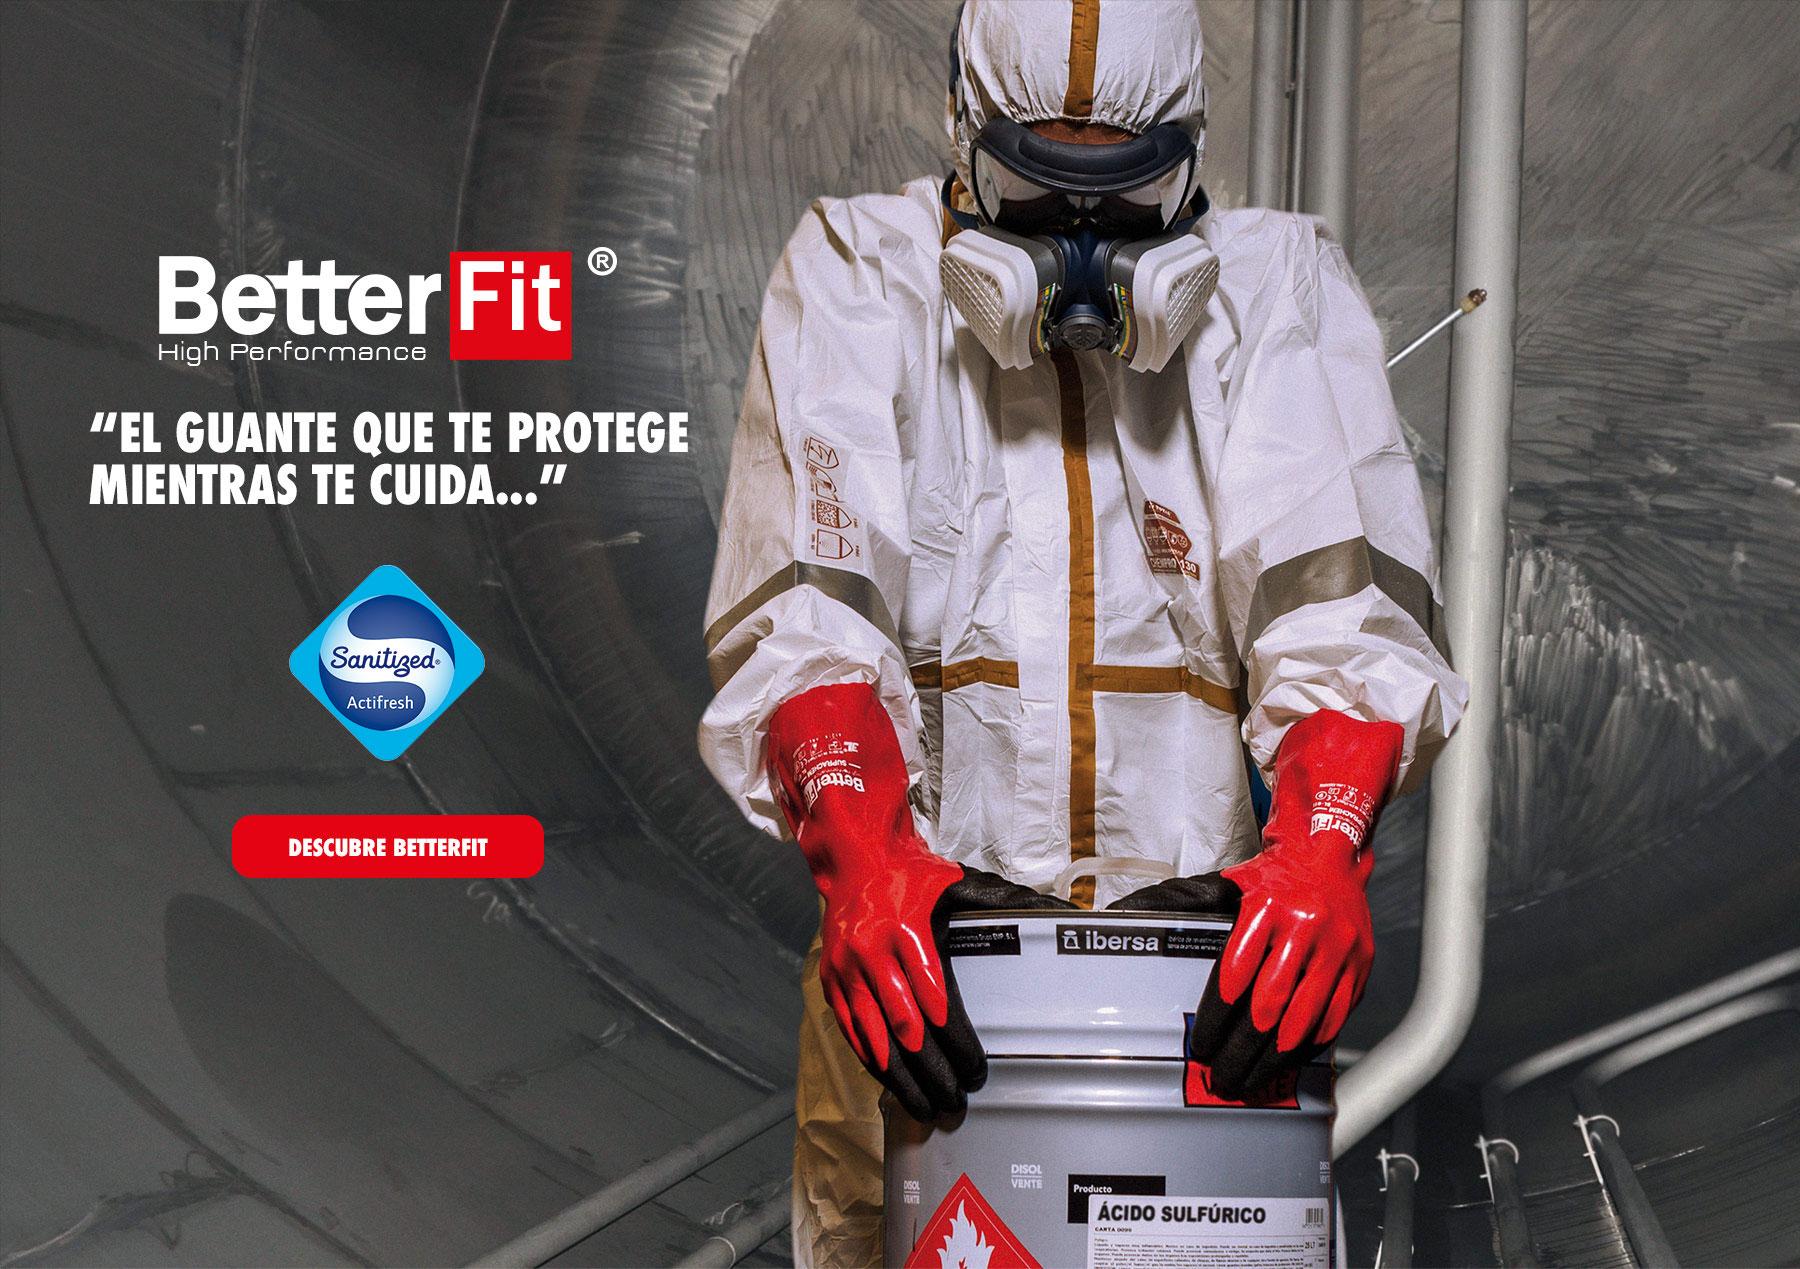 Tecnología BetterFit, 3L Internacional